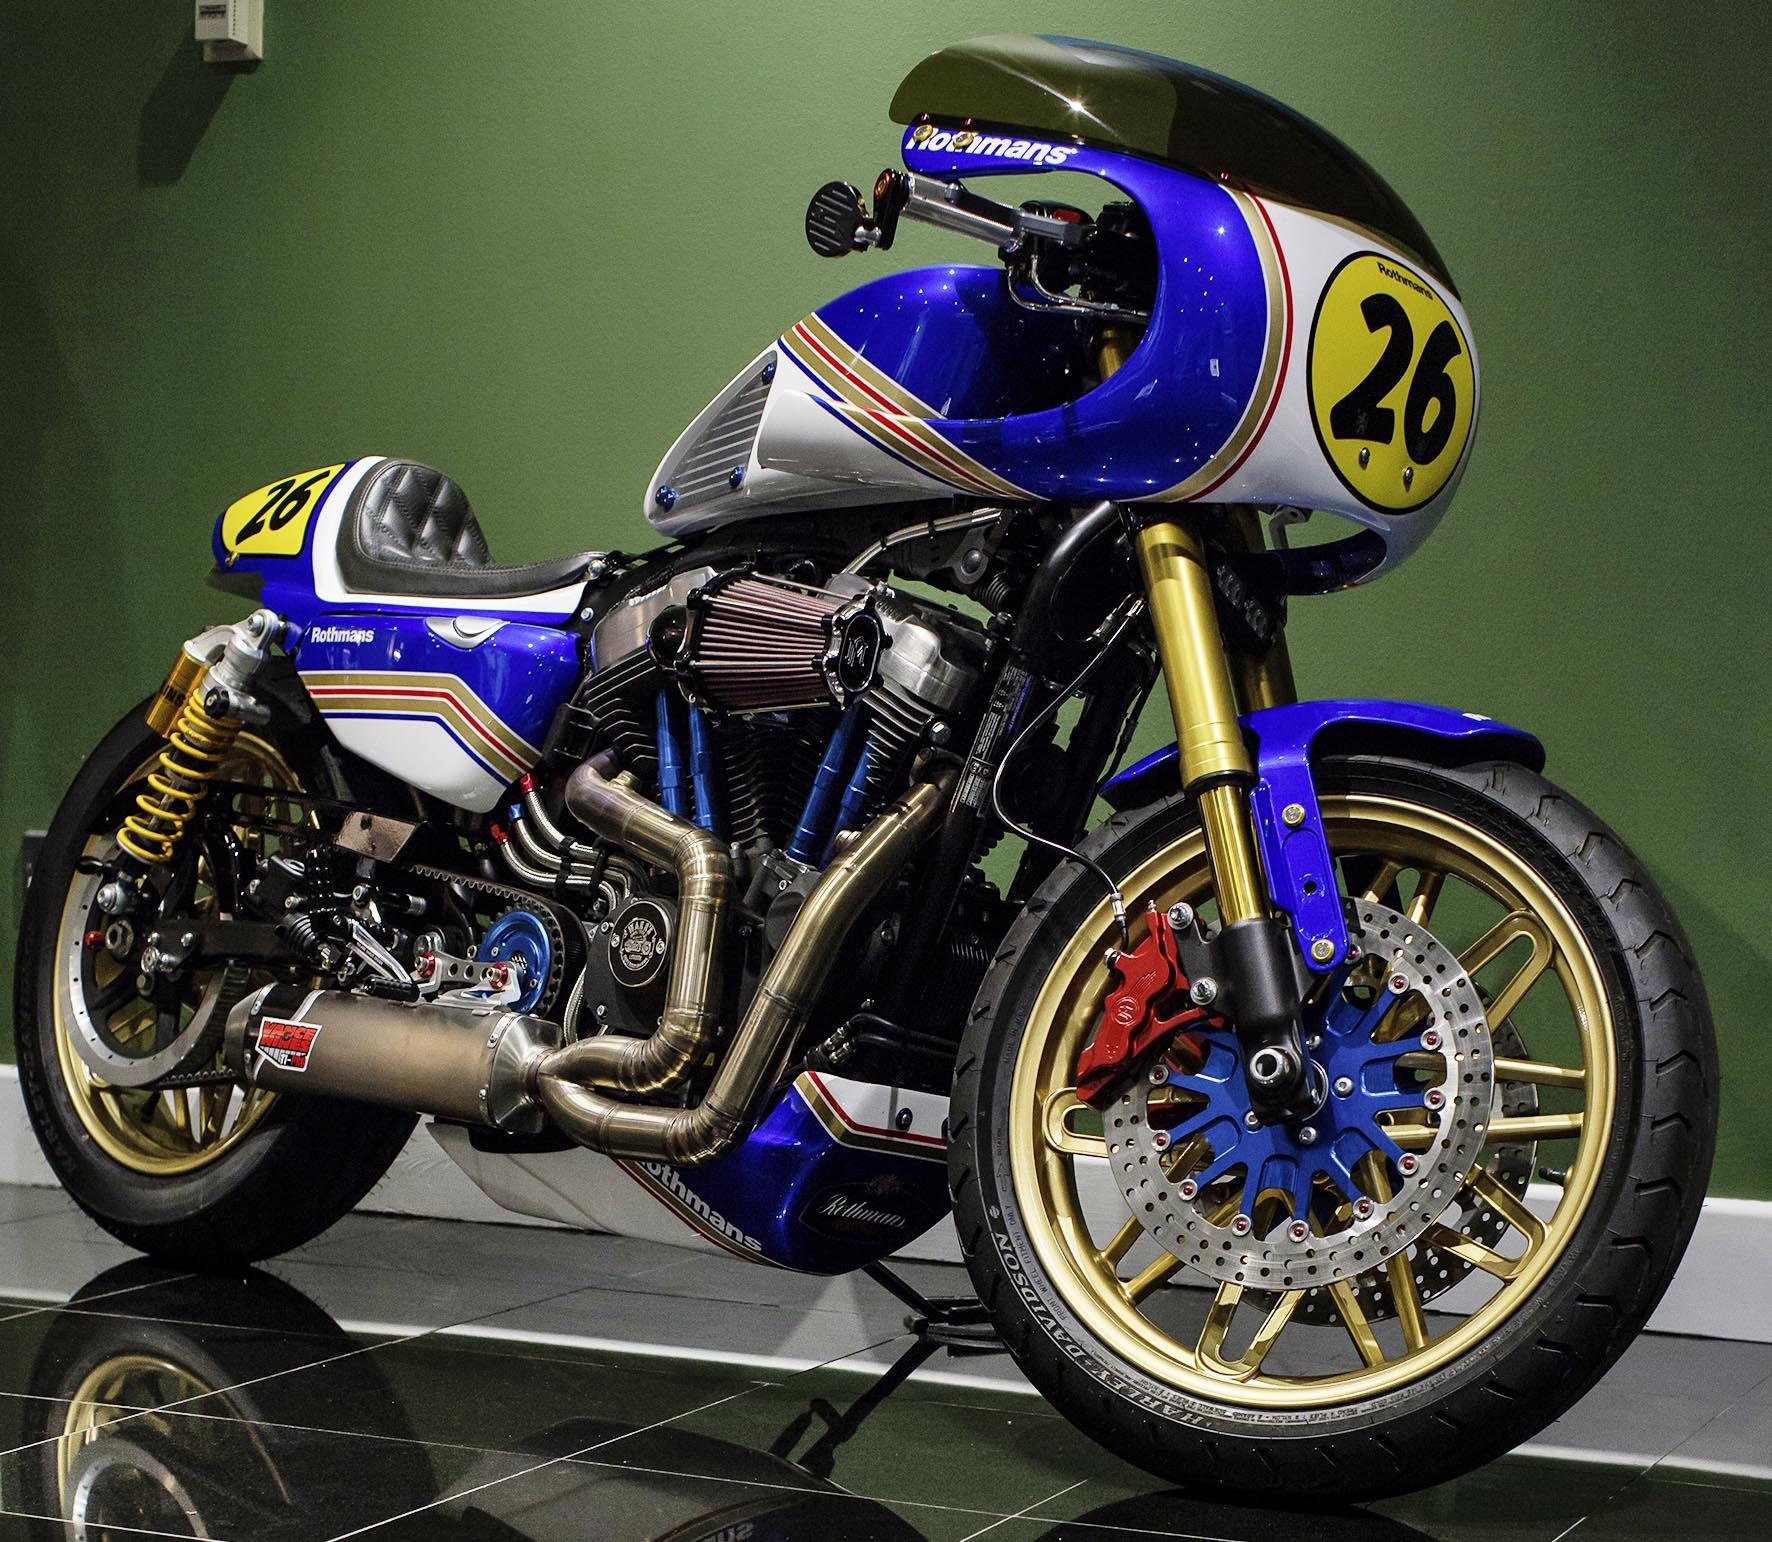 Rothmans Racer, Warrs Harley